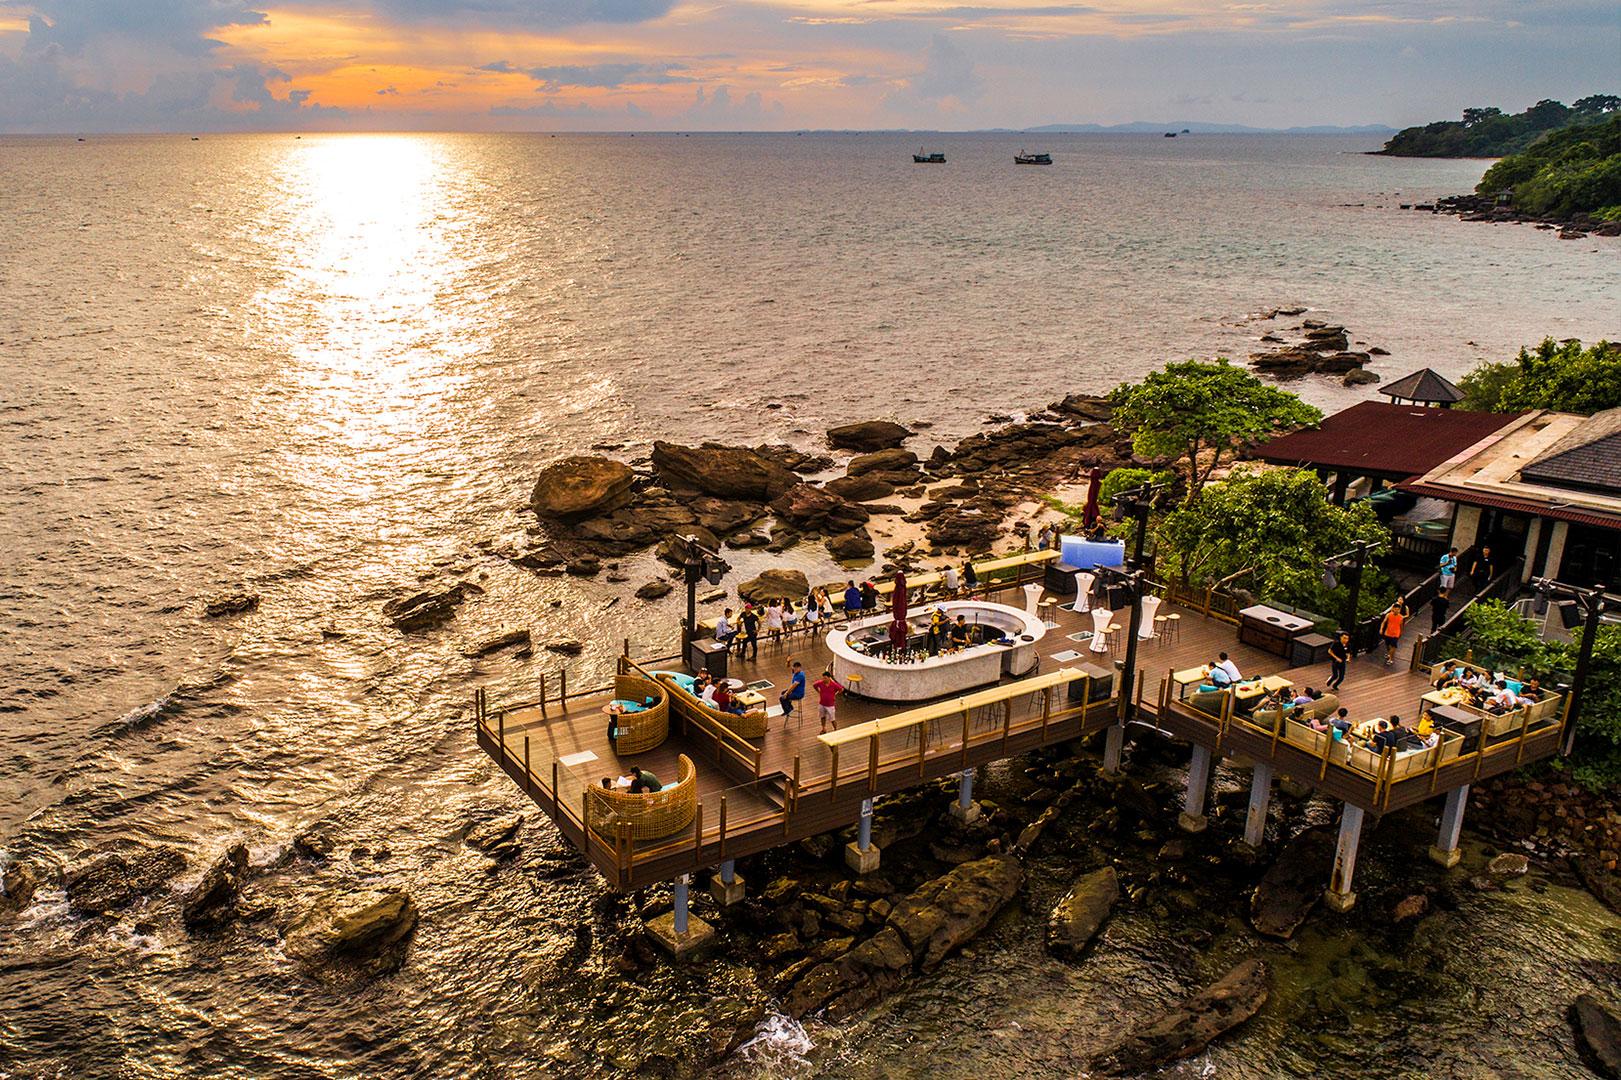 Rock Sunset Island Bar. Hình: Sưu tầm